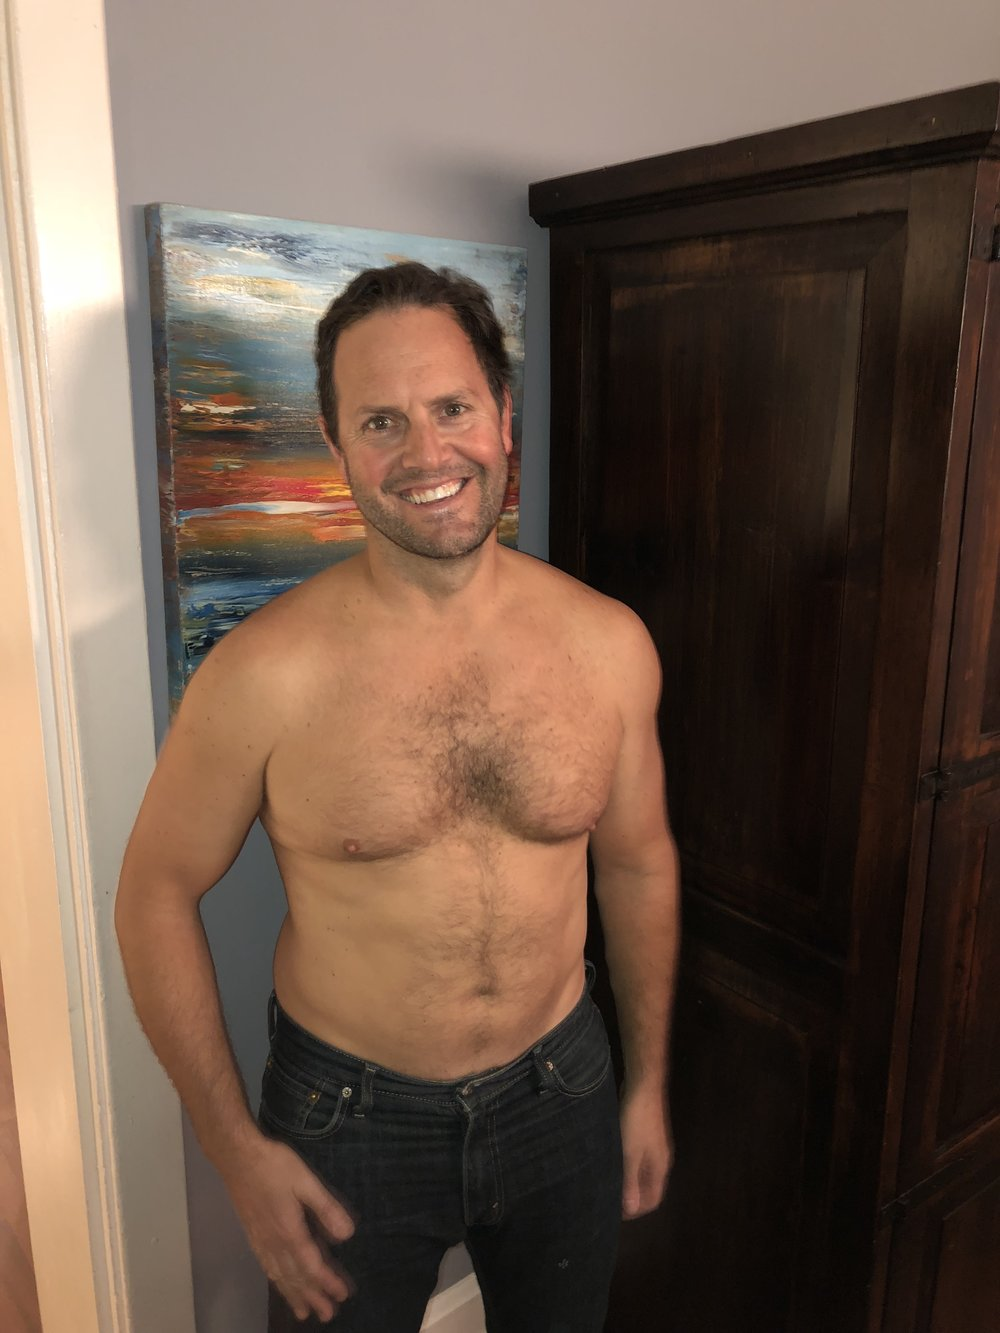 Day 1:188 lbs. - November 1, 2018